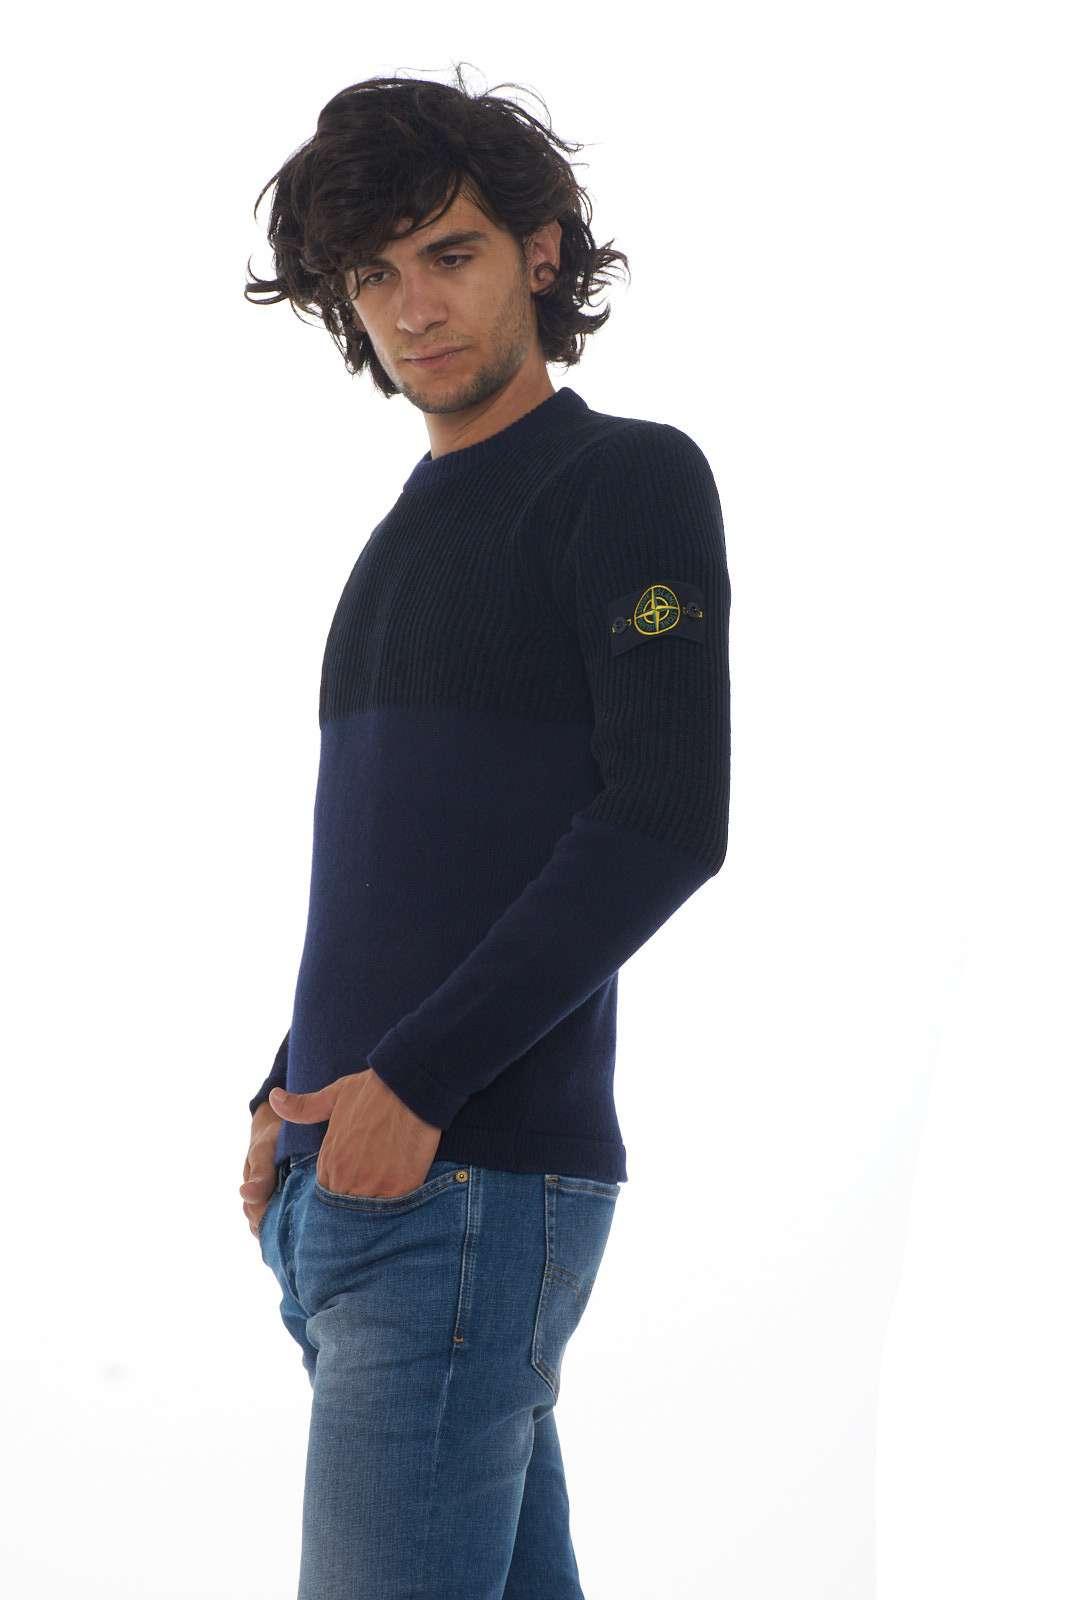 https://www.parmax.com/media/catalog/product/a/i/AI-outlet_parmax-maglia-uomo-Stone-Island-7115520B8-B_1.jpg